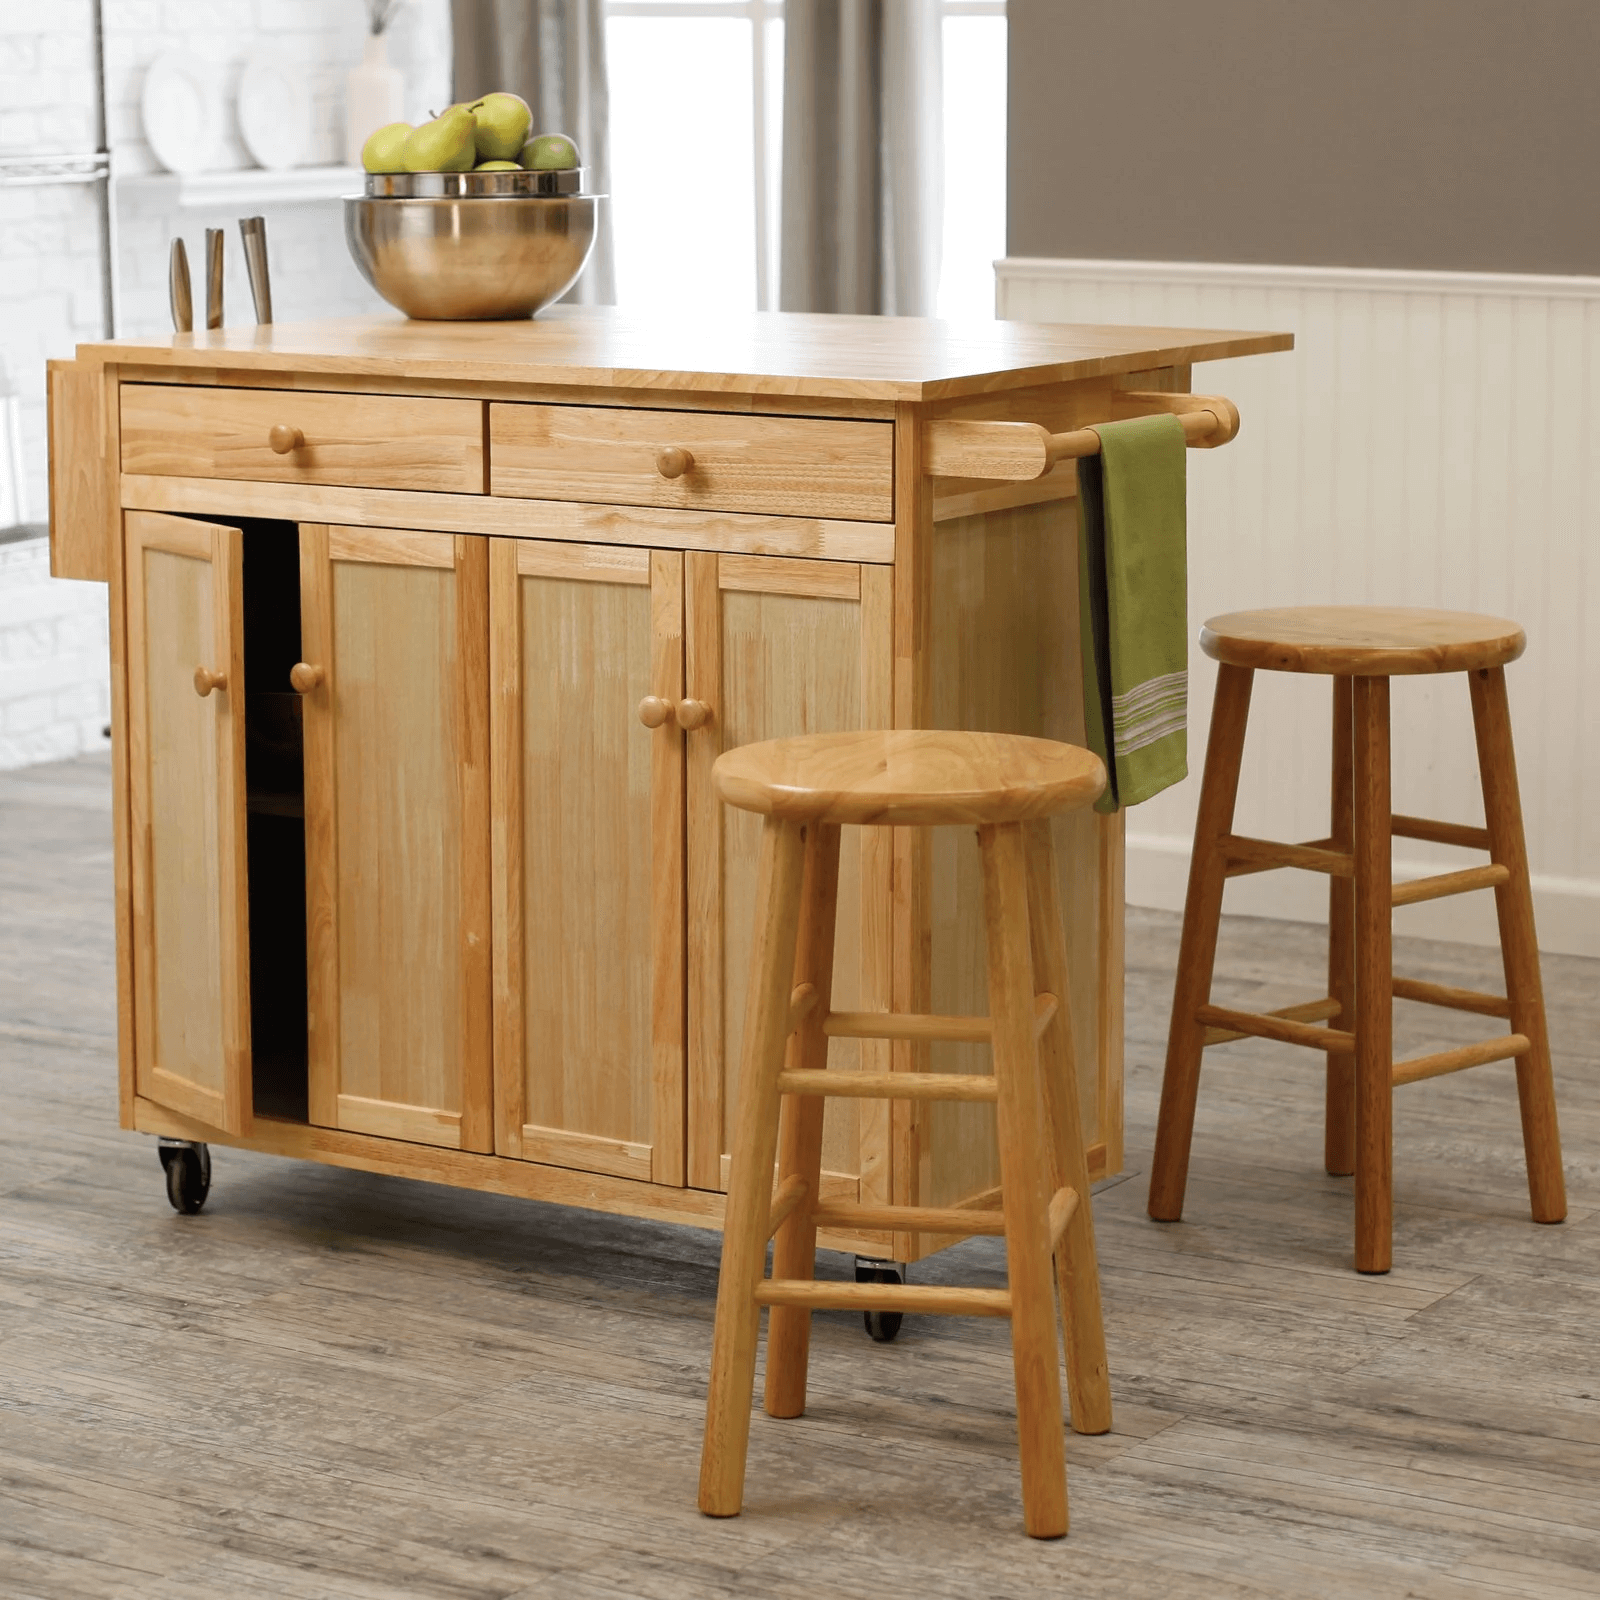 Natural wooden Kitchen Island Cart with Stools | Kitchen | Pinterest